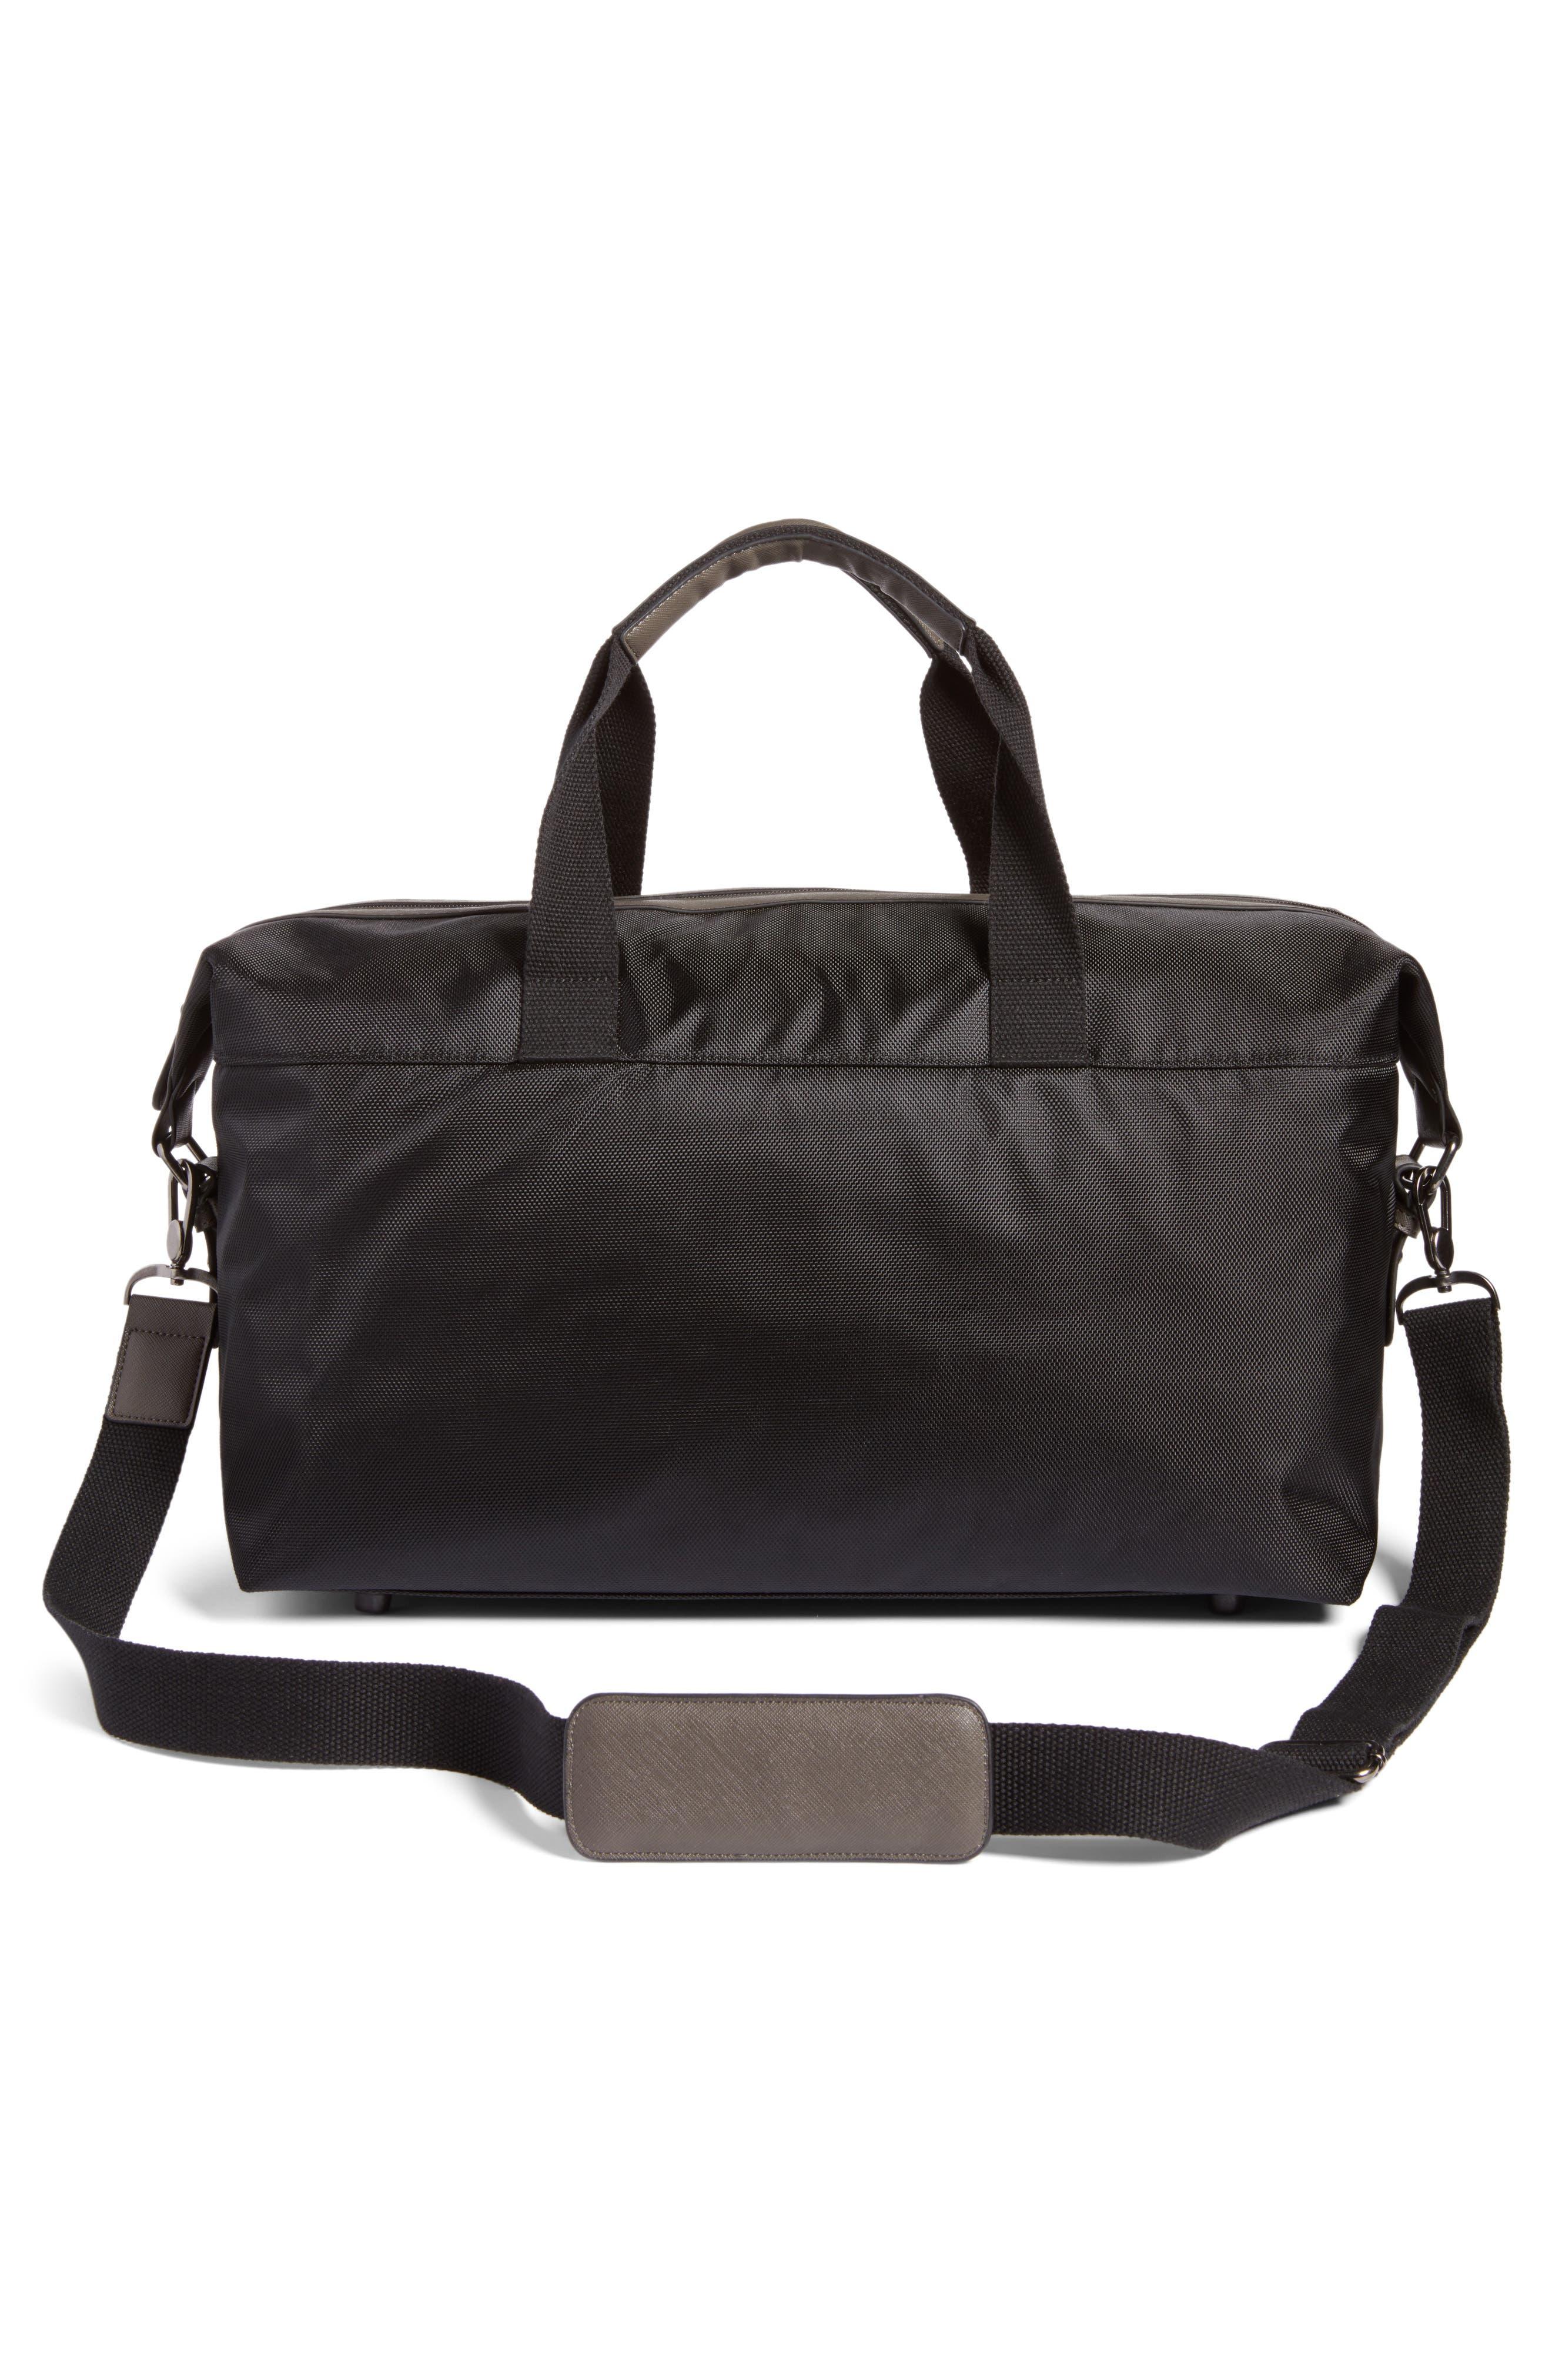 Zeebee Duffel Bag,                             Alternate thumbnail 3, color,                             Black